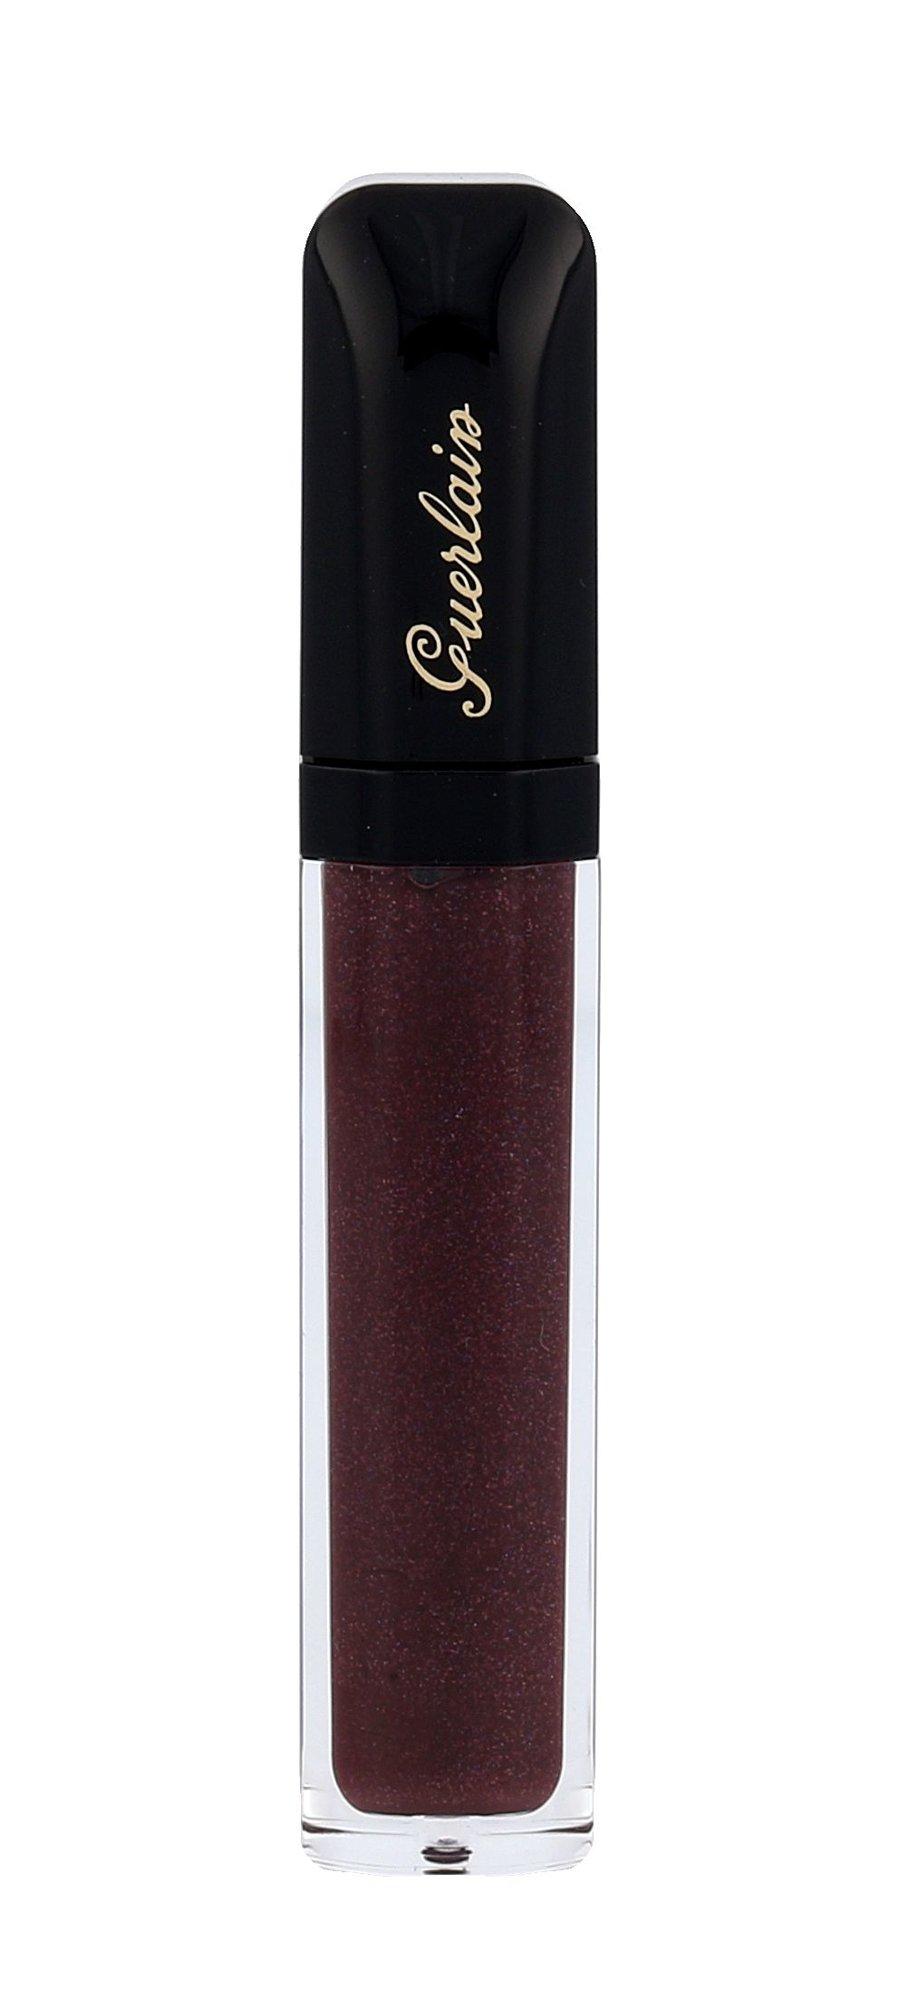 Guerlain Maxi Shine Cosmetic 7,5ml 863 Madame Fascine